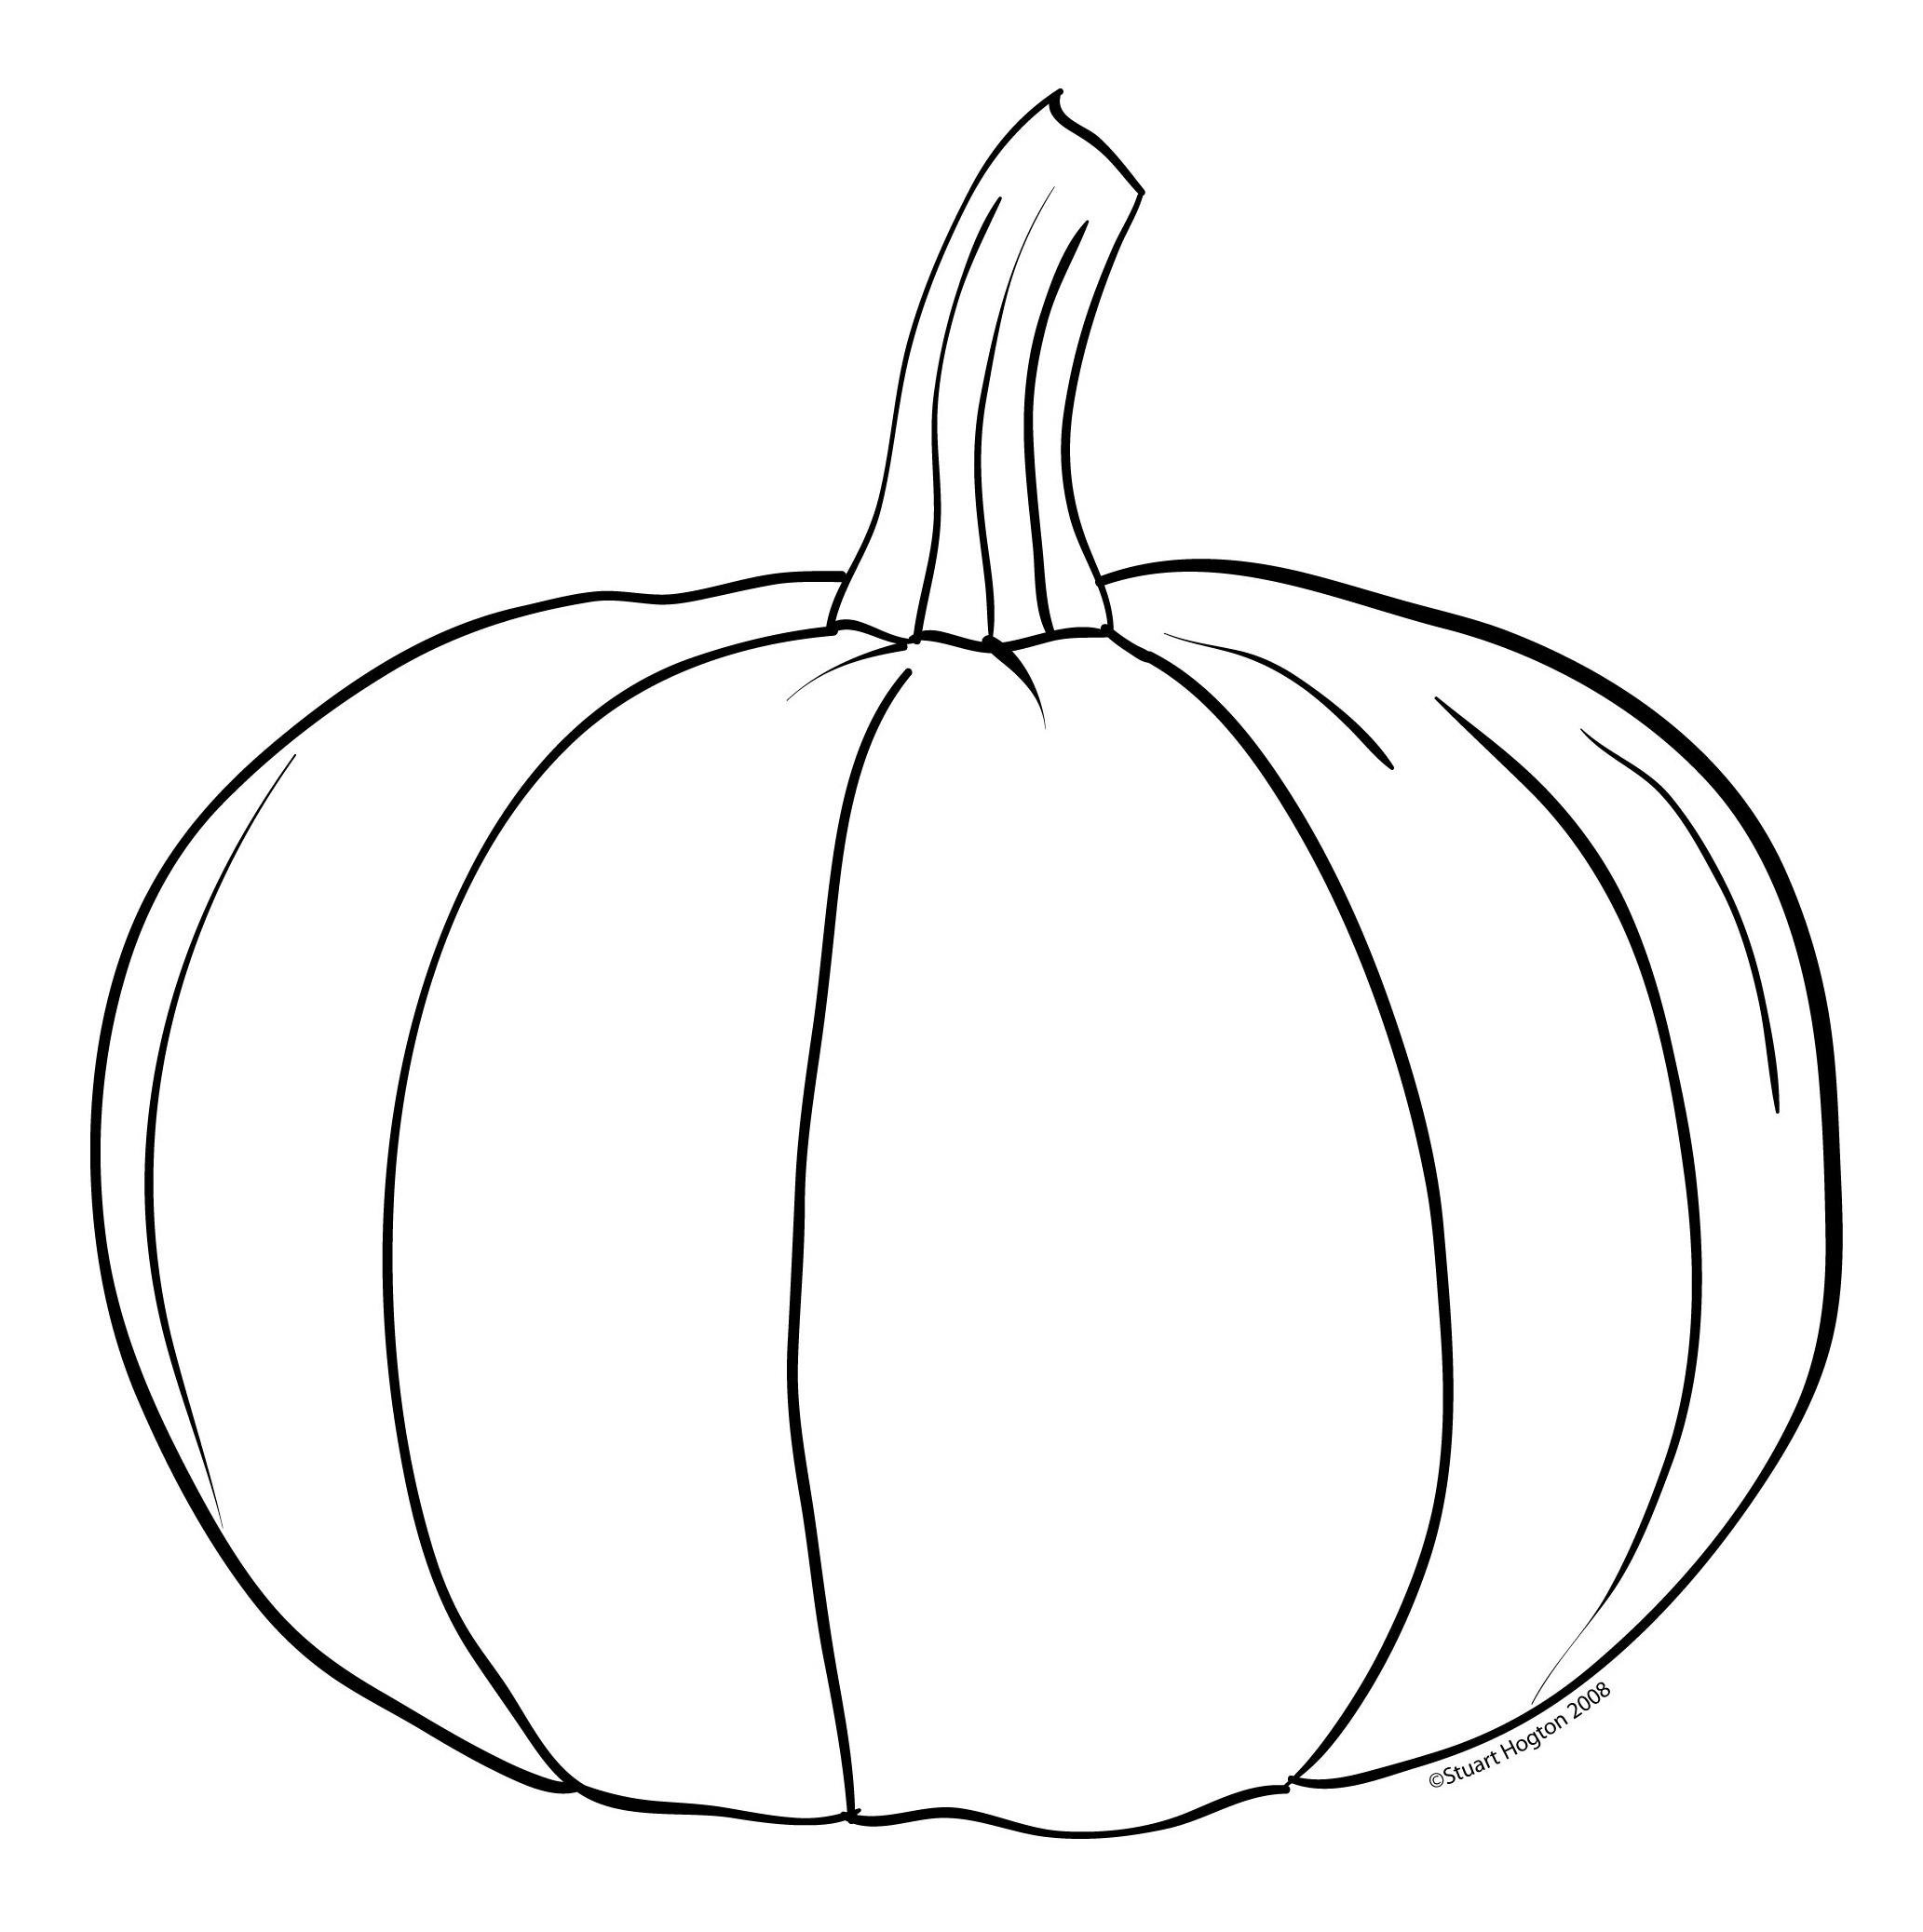 Drawn pumpkin color Outline Pumpkin Free Images Simple